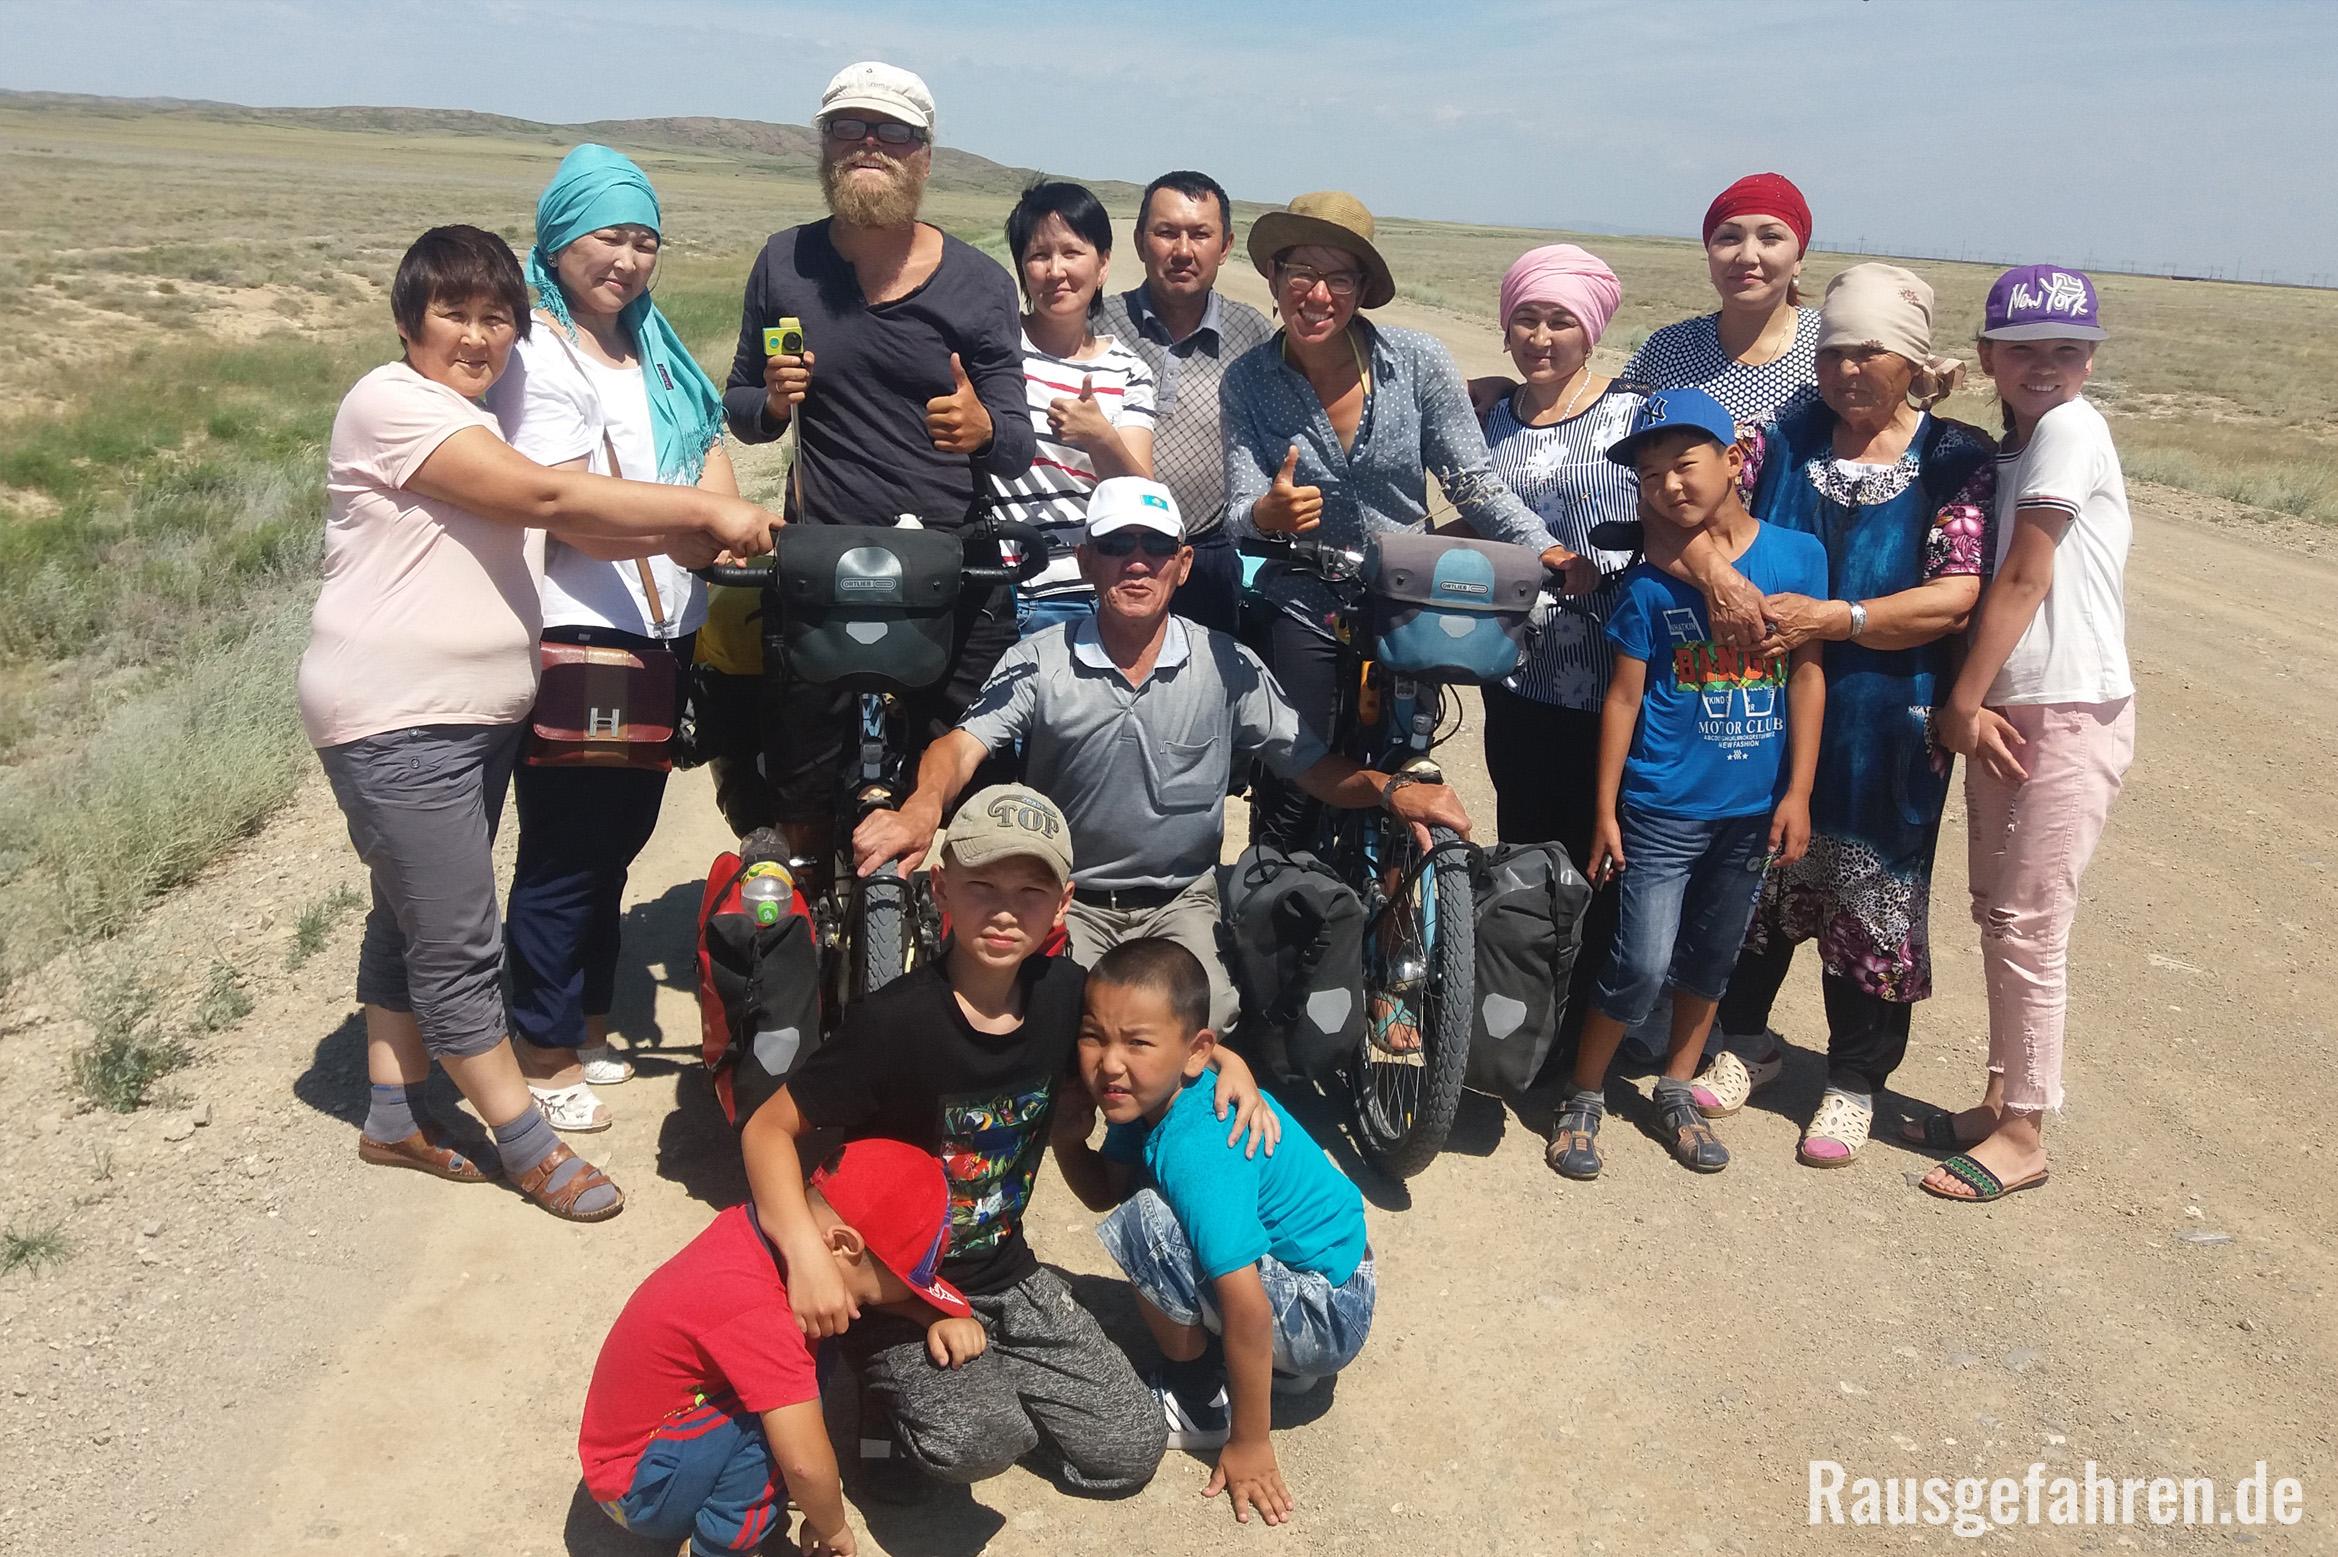 Fahrrad fahren in Kasachstan